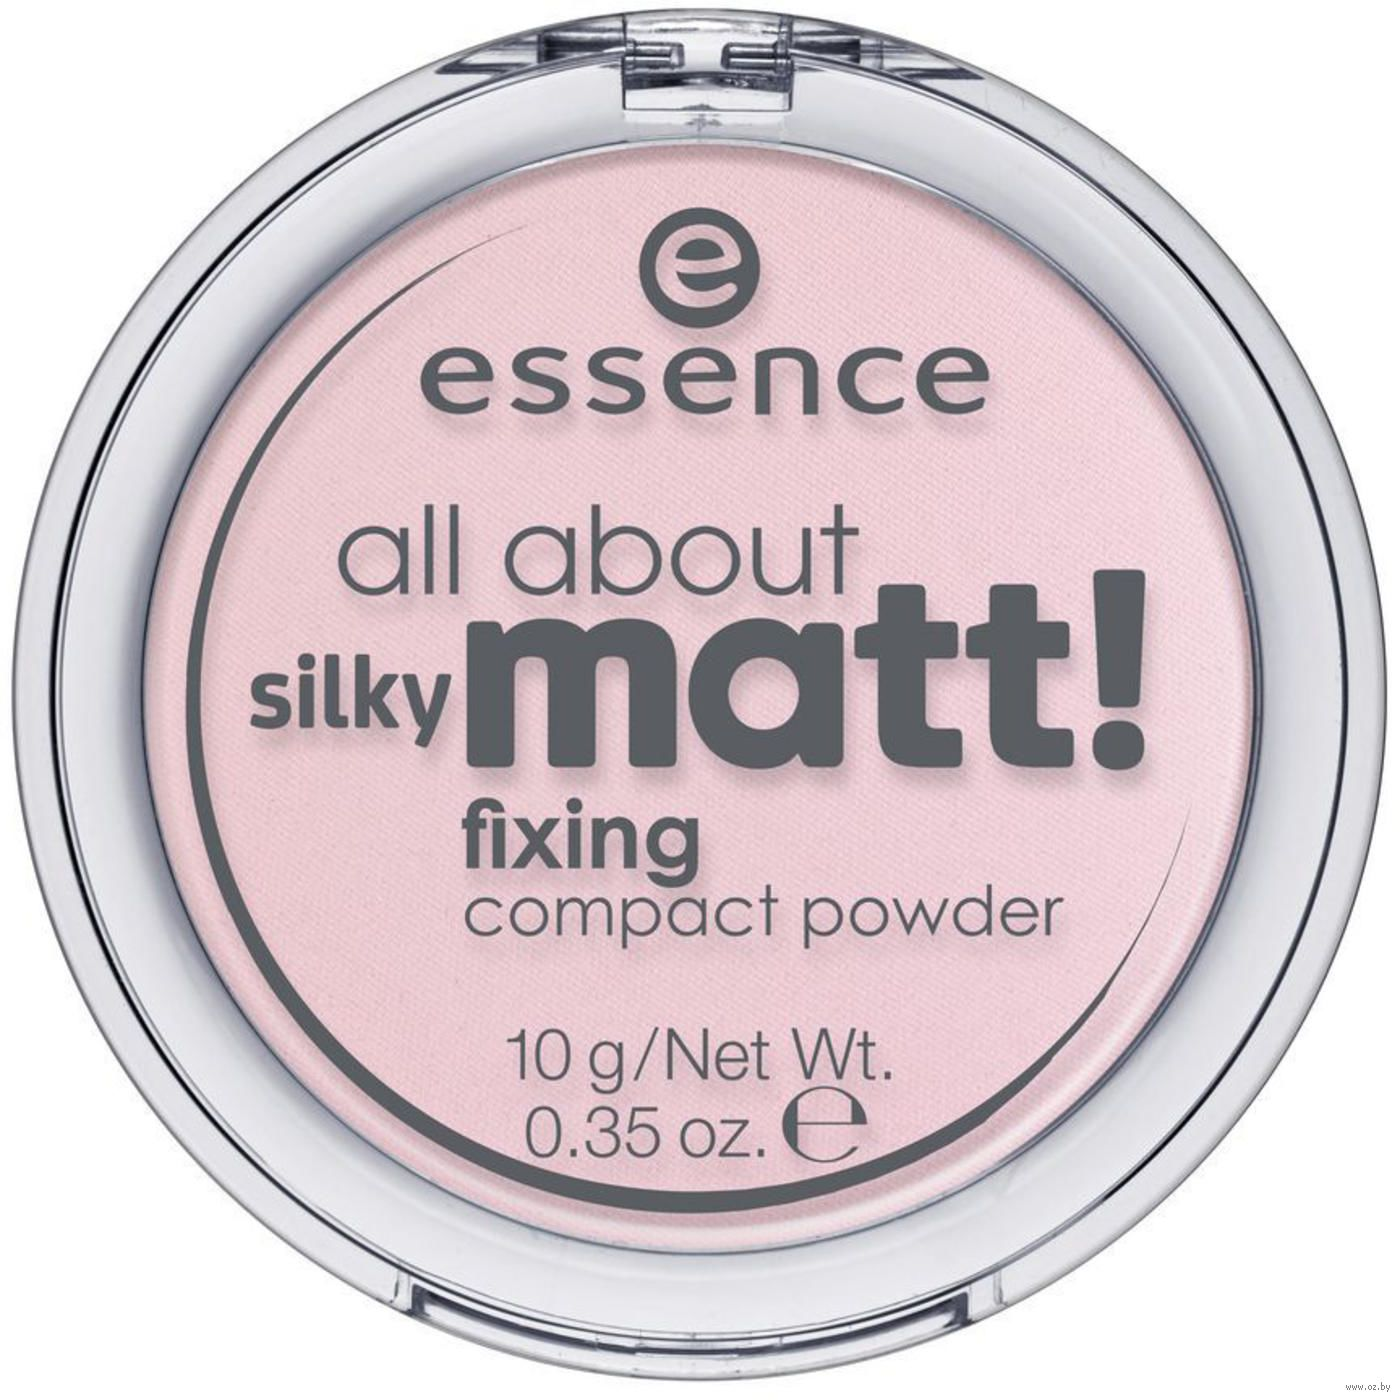 Пудра Essence «All About Silky Matt!» тон 10. Купить пудру Эссенс в Минске  в интернет-магазине — OZ.by 0ad4caef1fa